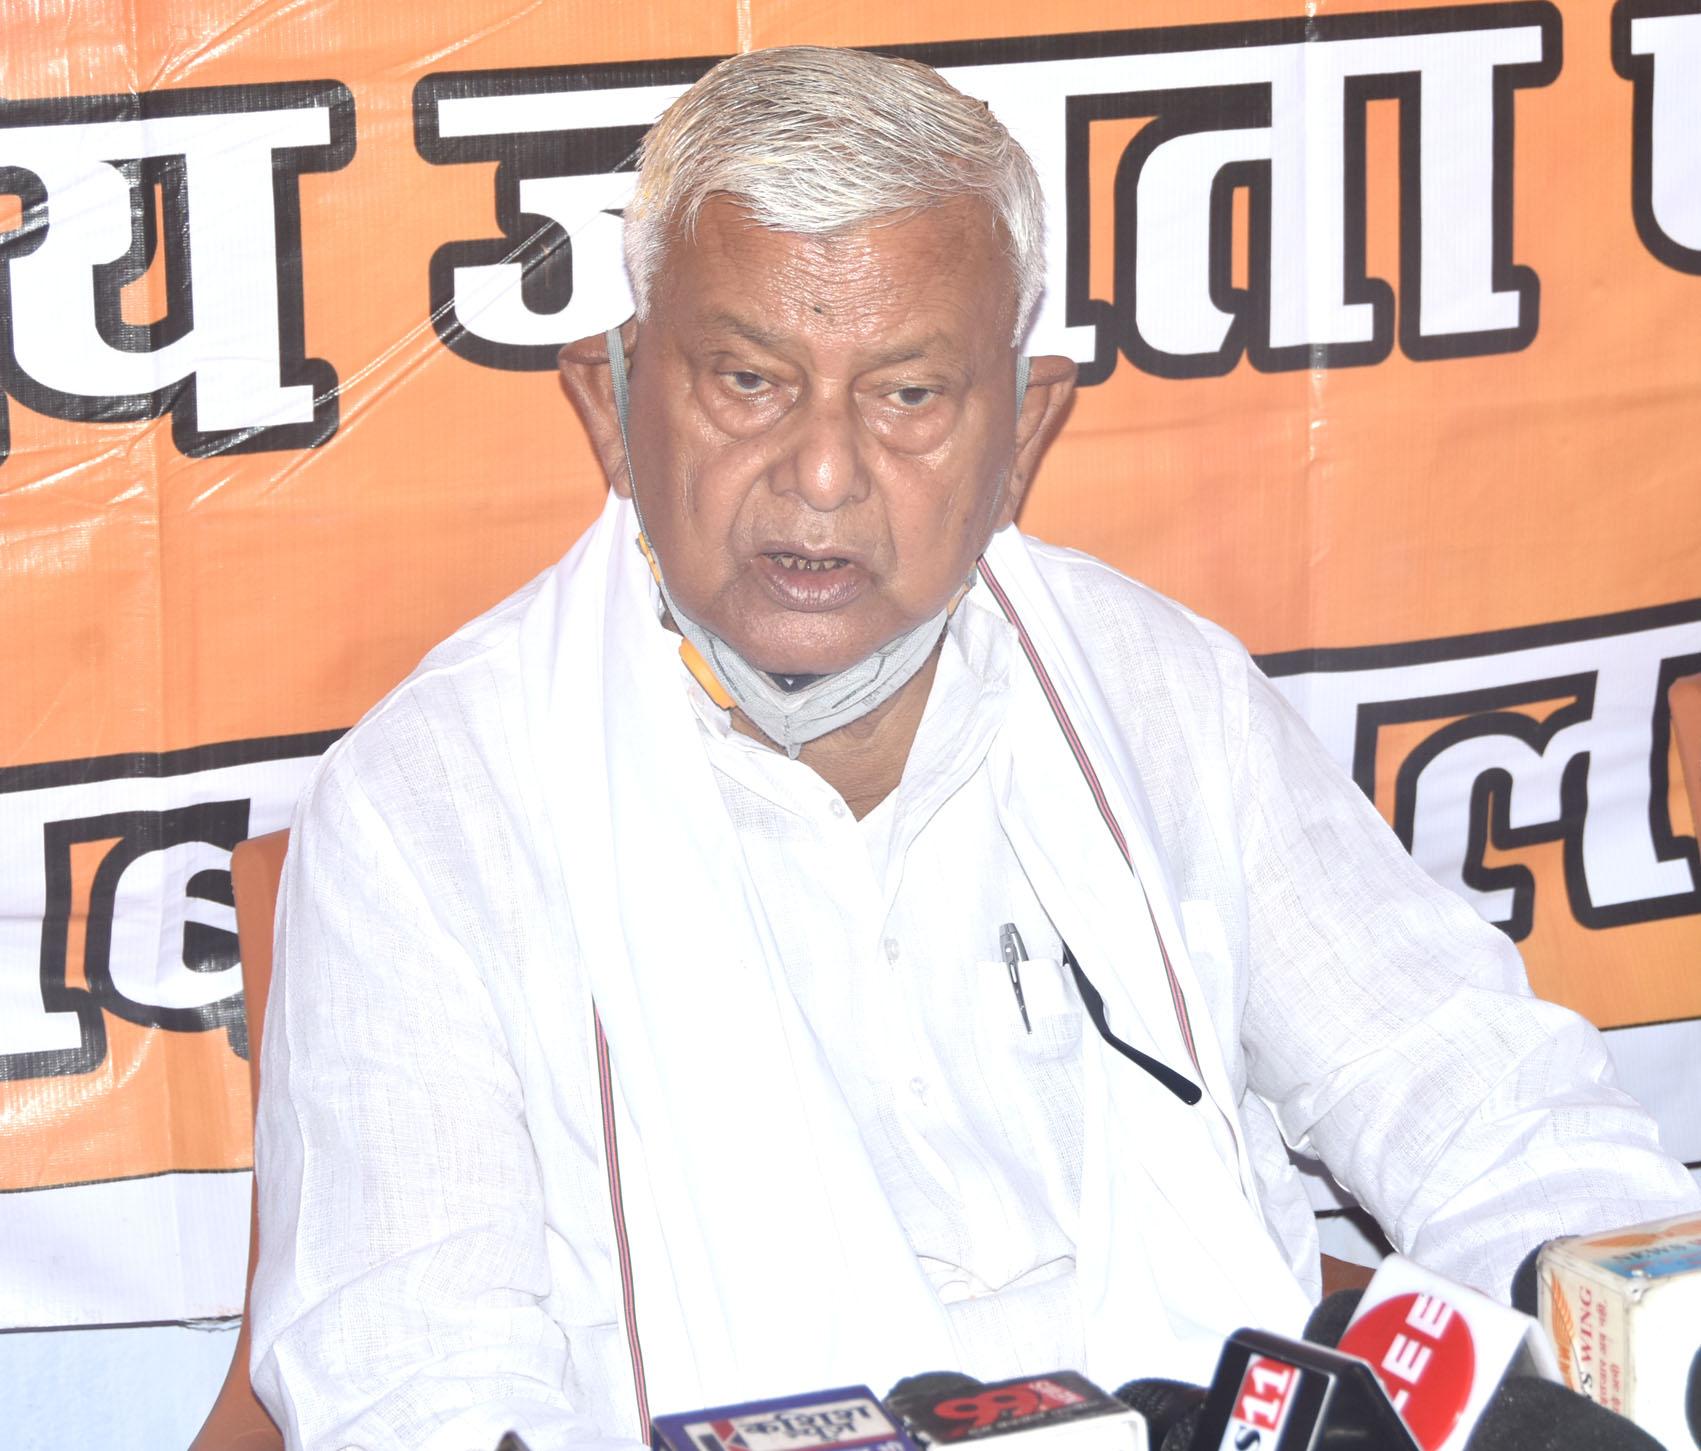 Dhandbad MP P.N. Singh speaks at the district  BJP office in Dhanbad on Monday, June 22, 2020